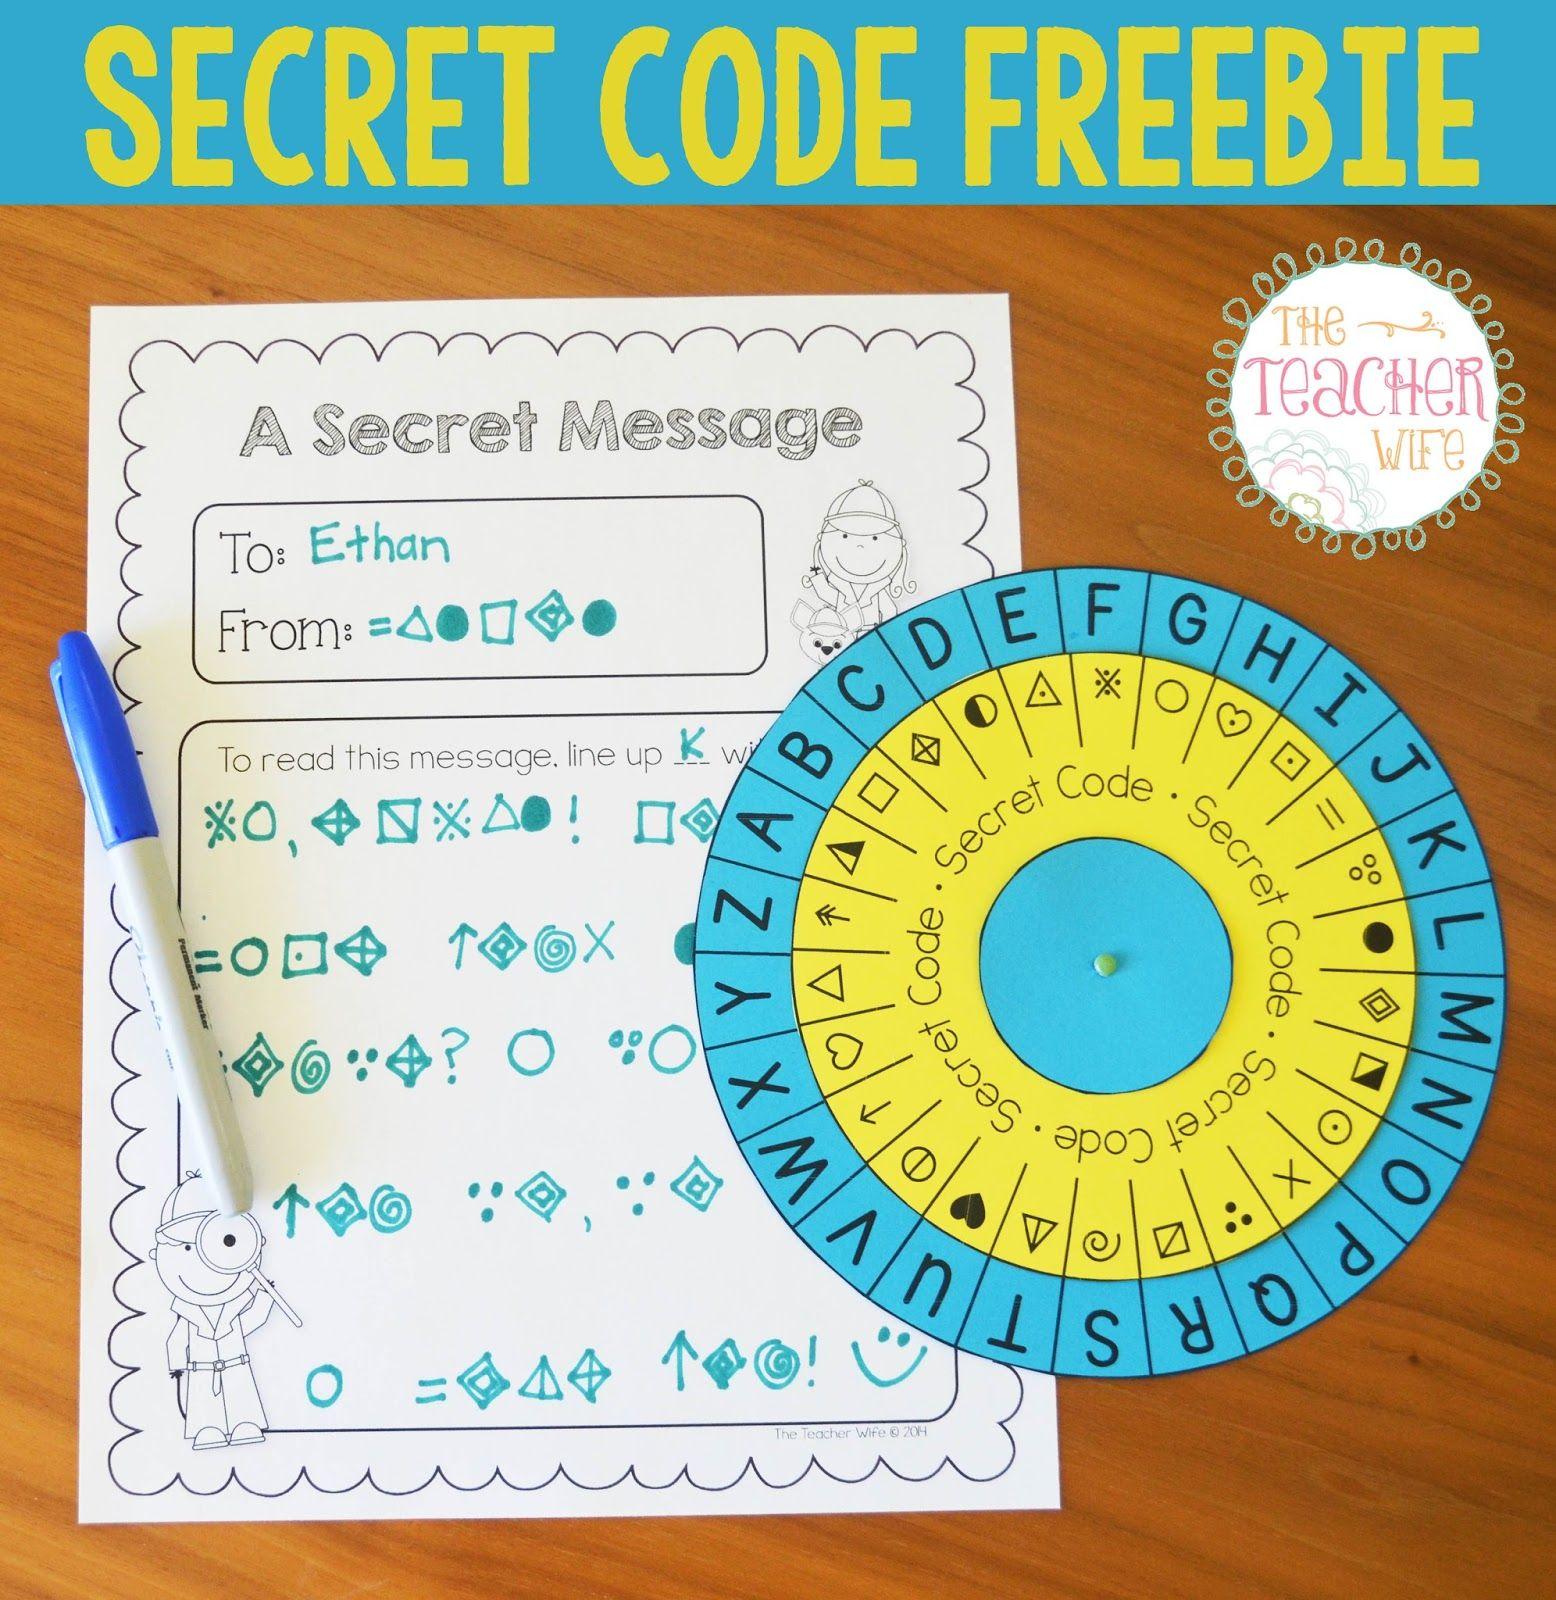 Secret Code Freebie (the teacher wife) | Pinterest | Secret code ...